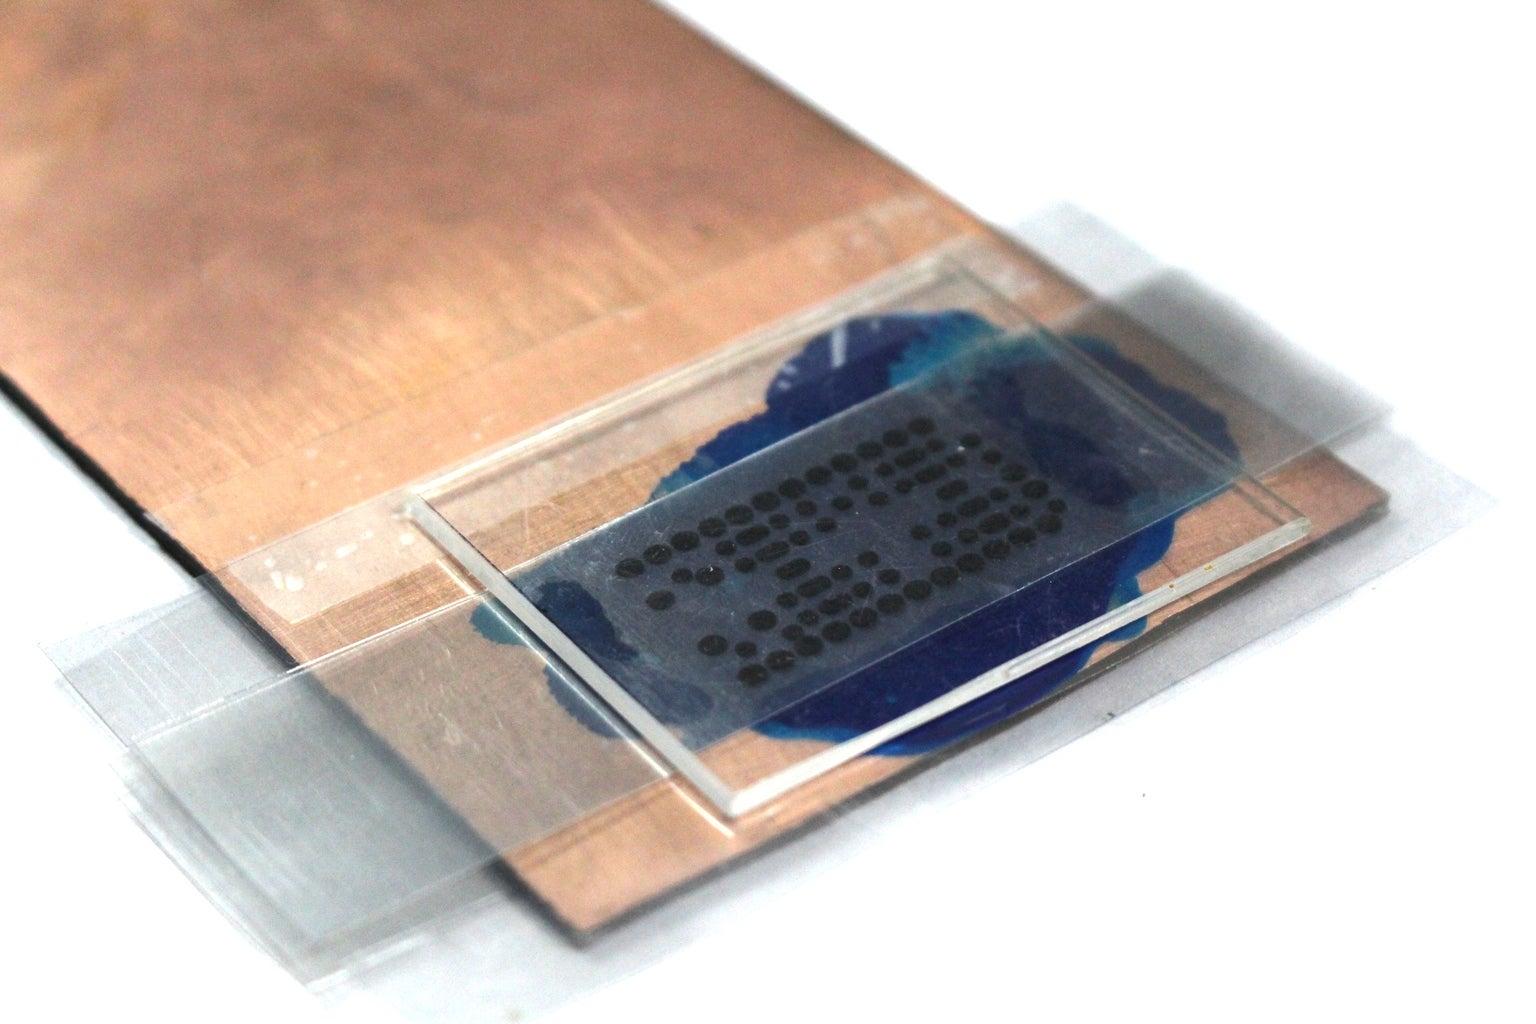 Fabricating PCB: Soldermask